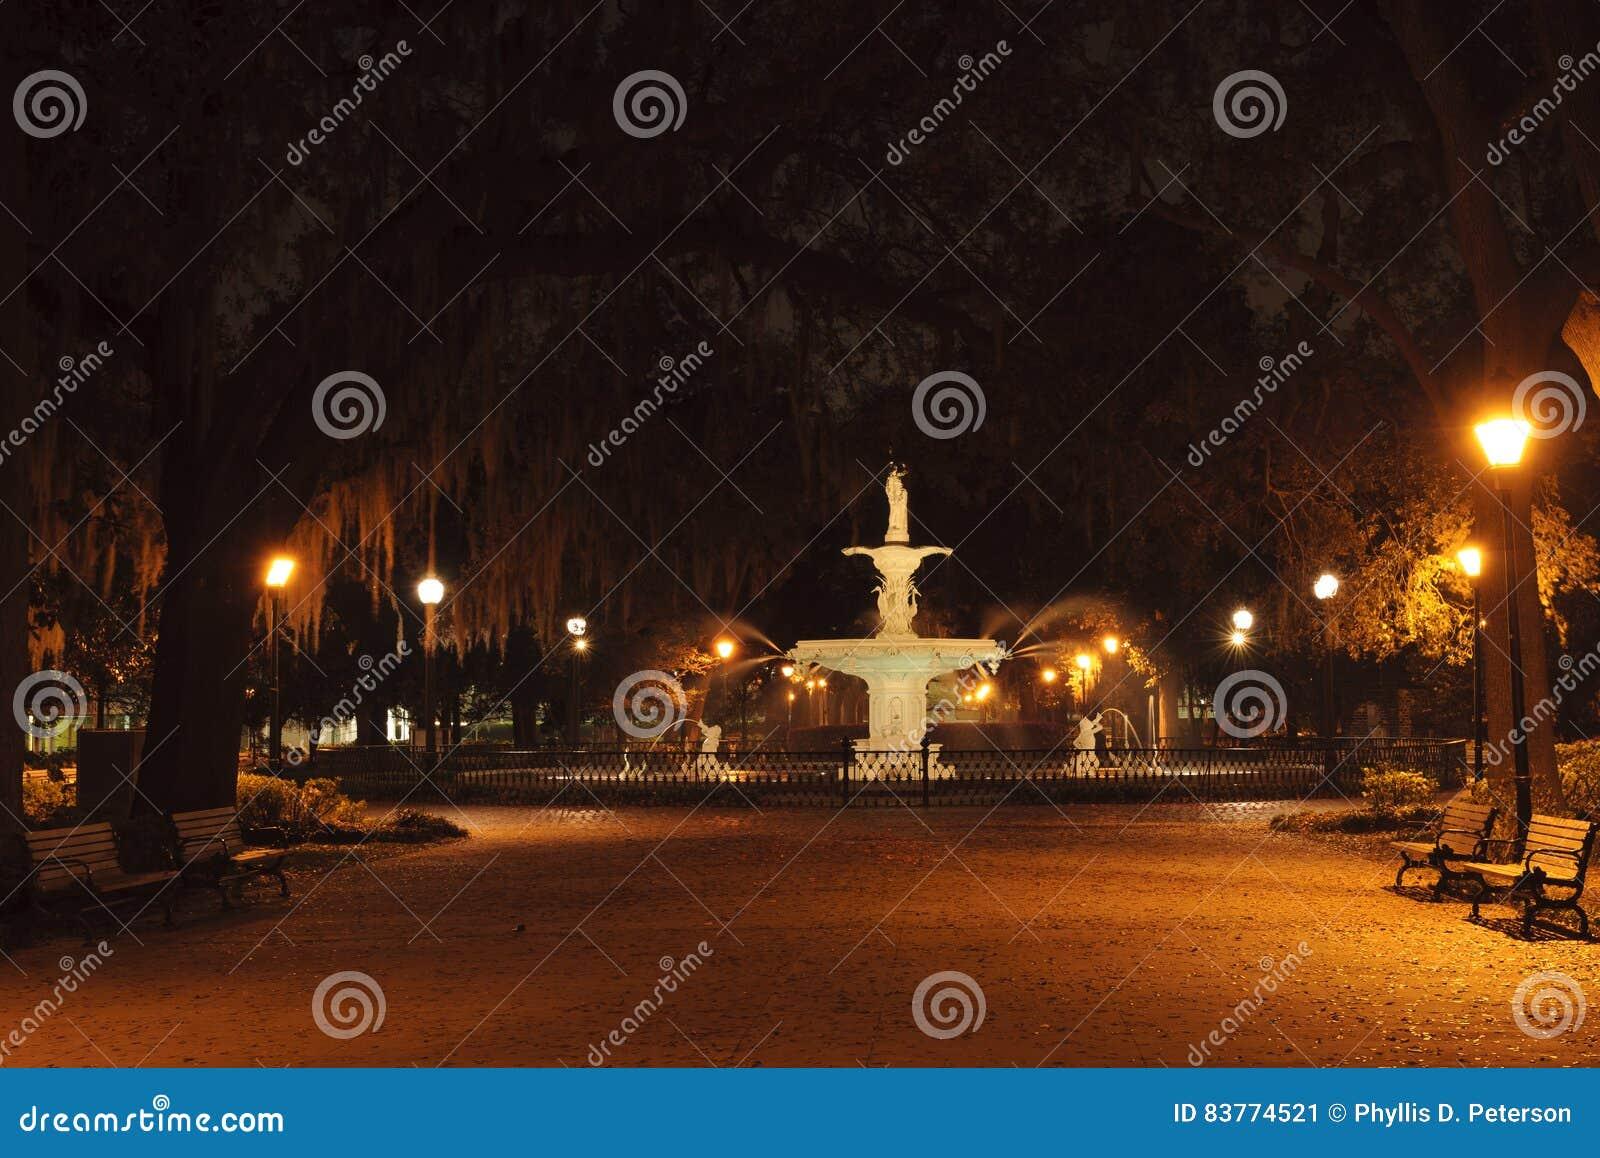 Forsyth Park Fountain at night in the city of Savannah, GA